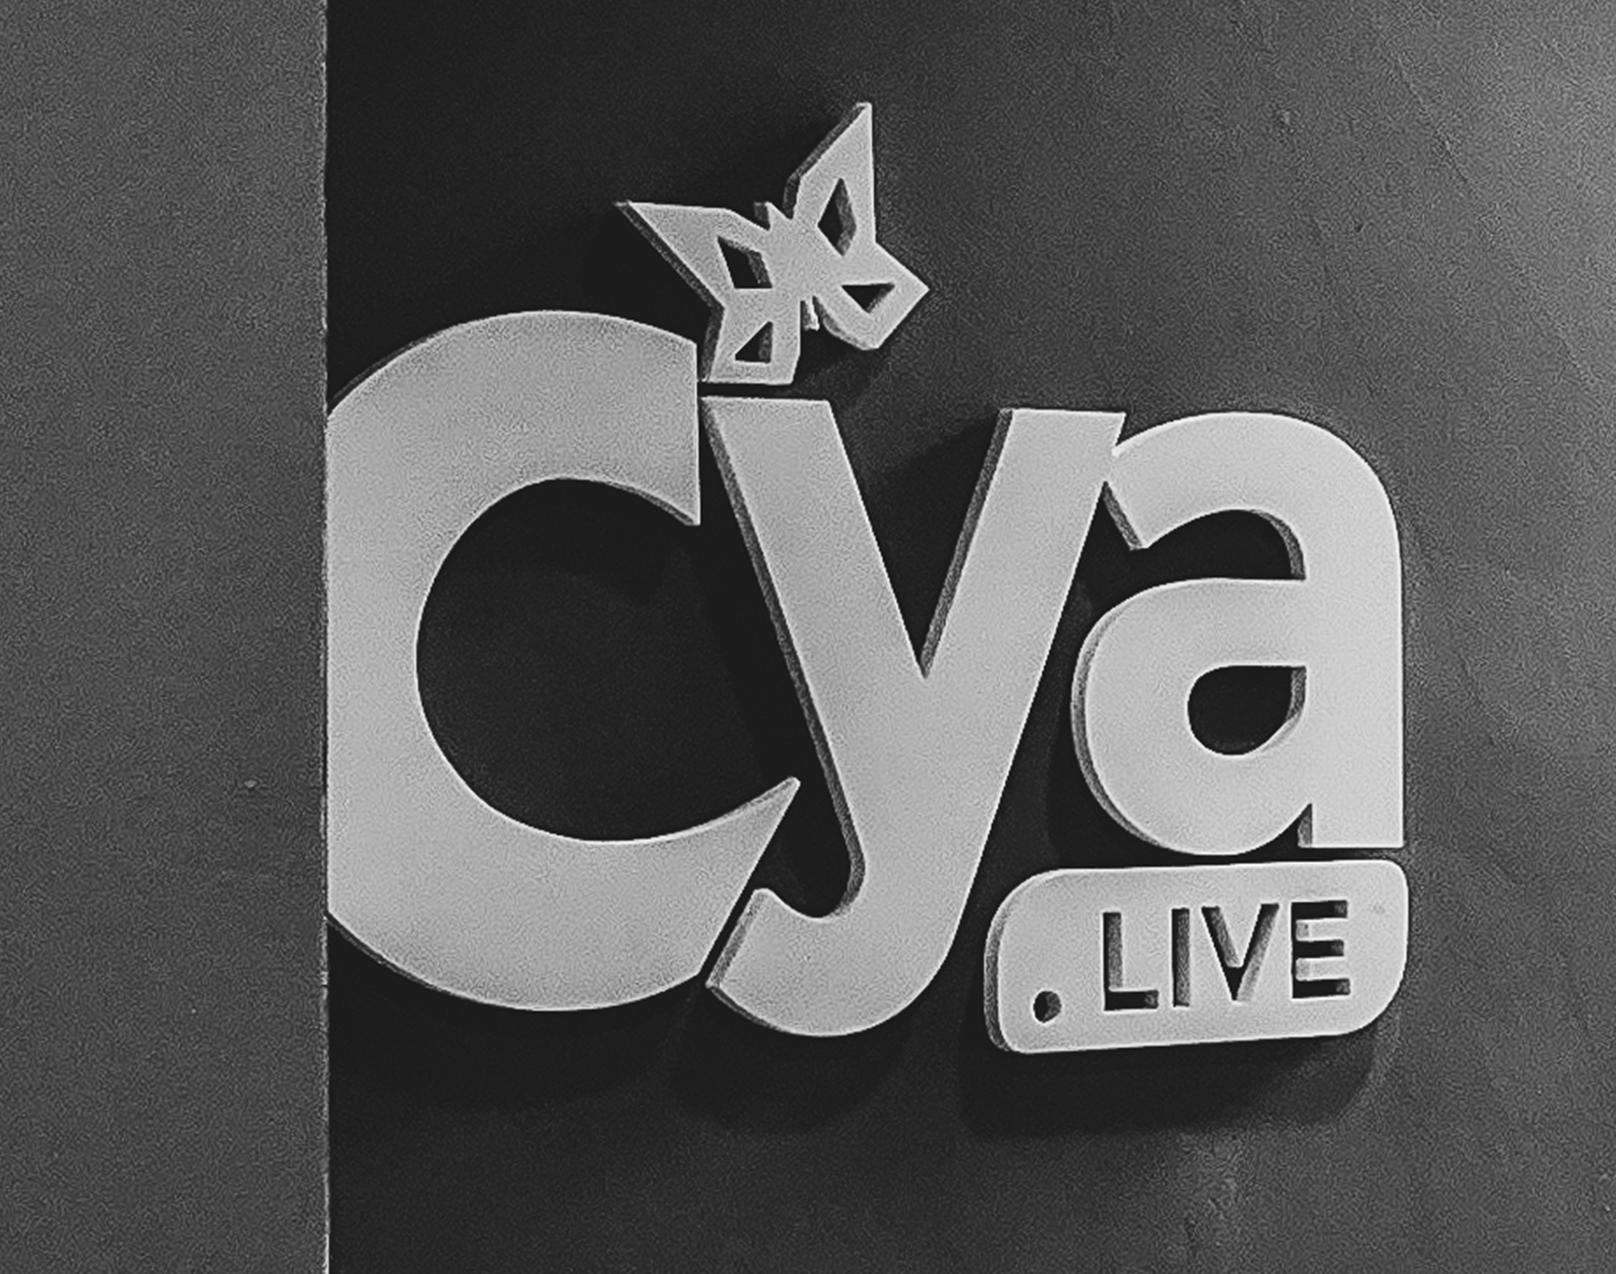 Cya Live